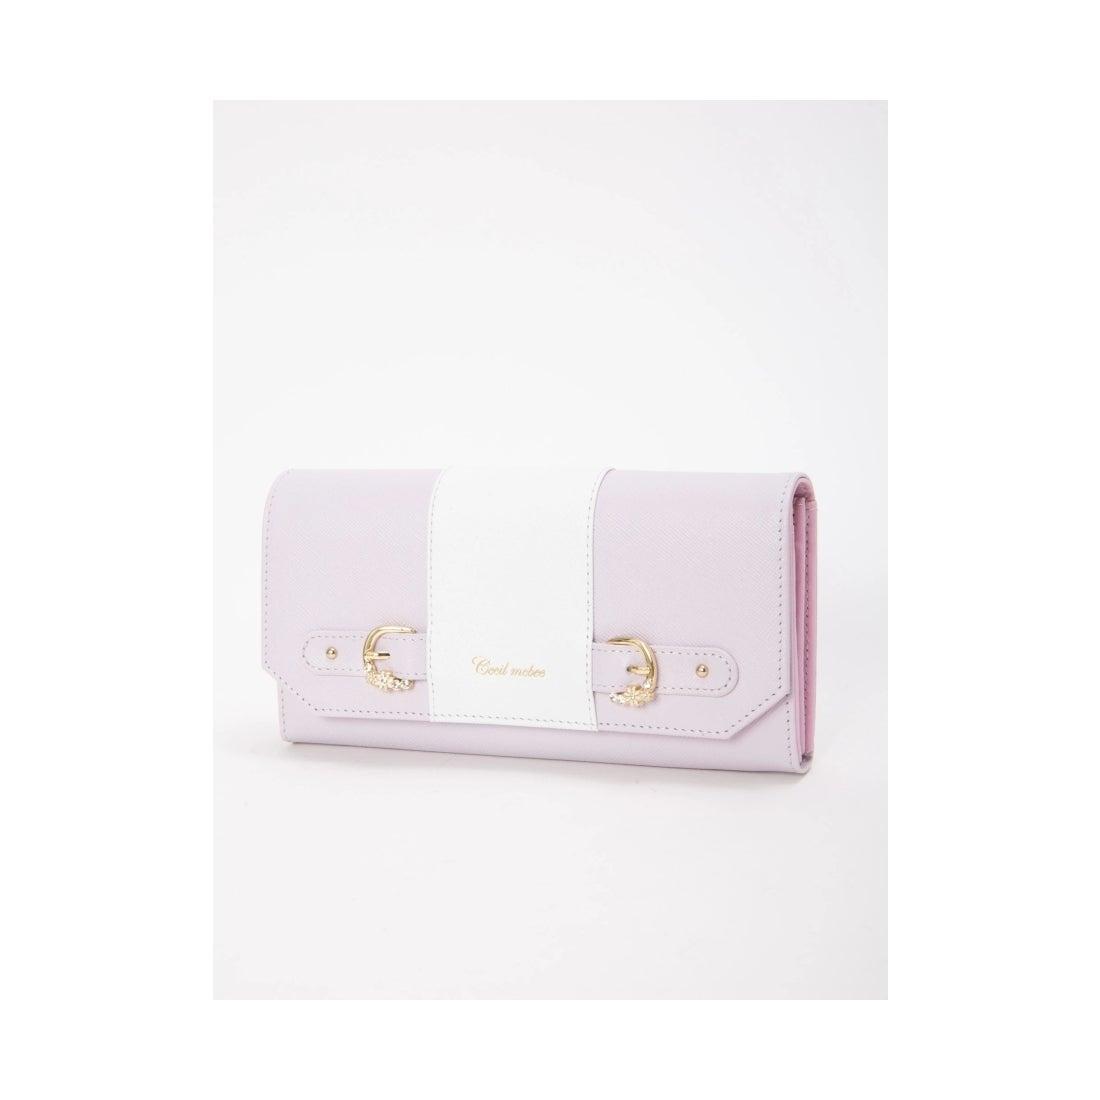 8e94d325f803 セシルマクビー(CECIL McBEE) 財布 ショルダーバッグ - 価格.com